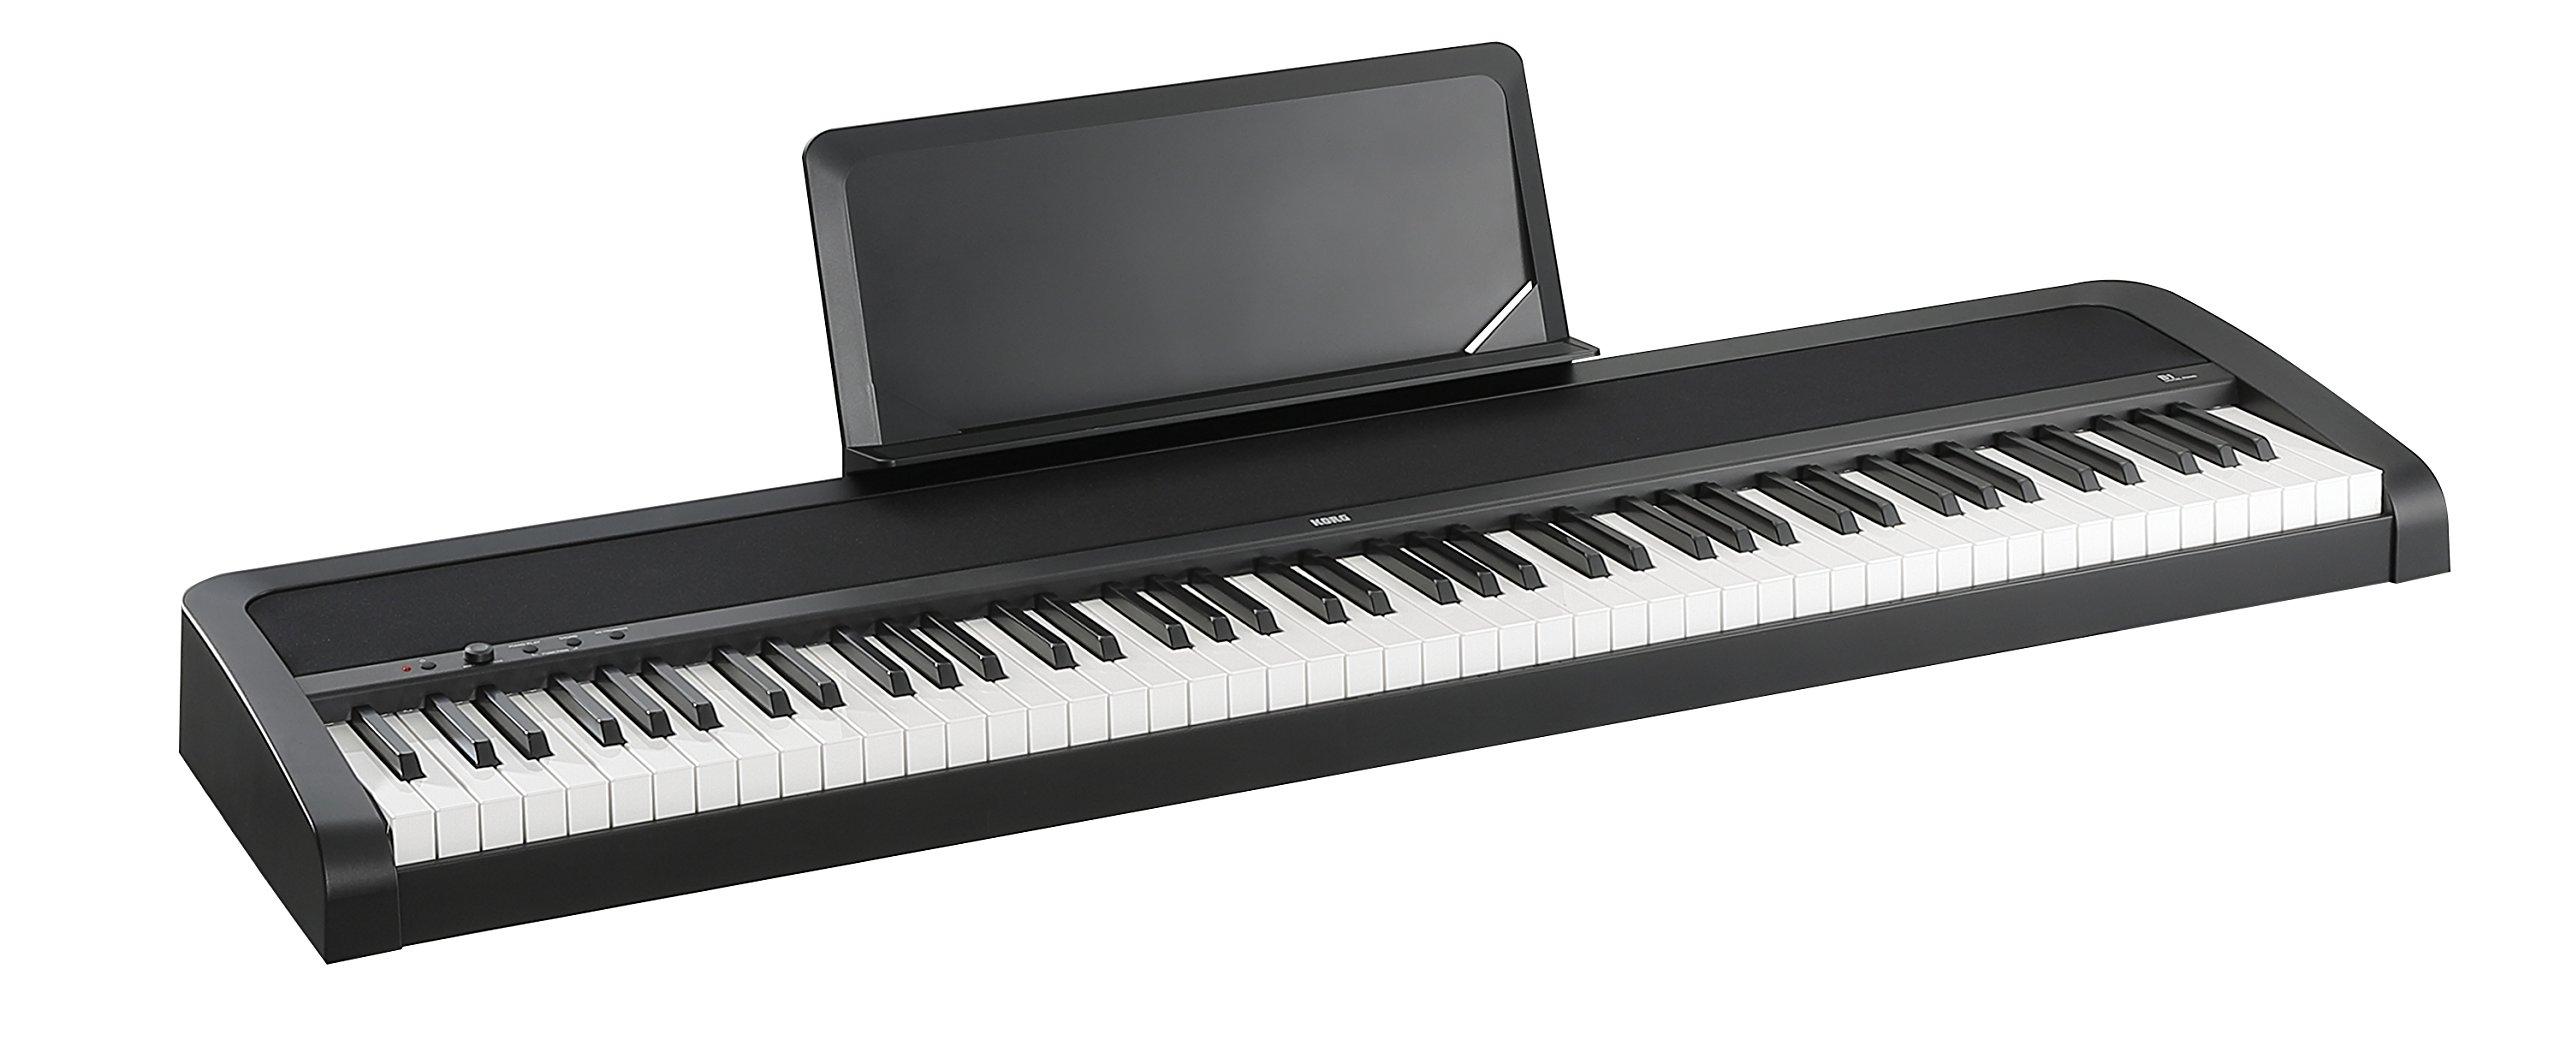 Korg B1 88 Key Digital Piano with Enhanced Speaker System Black by Korg (Image #2)